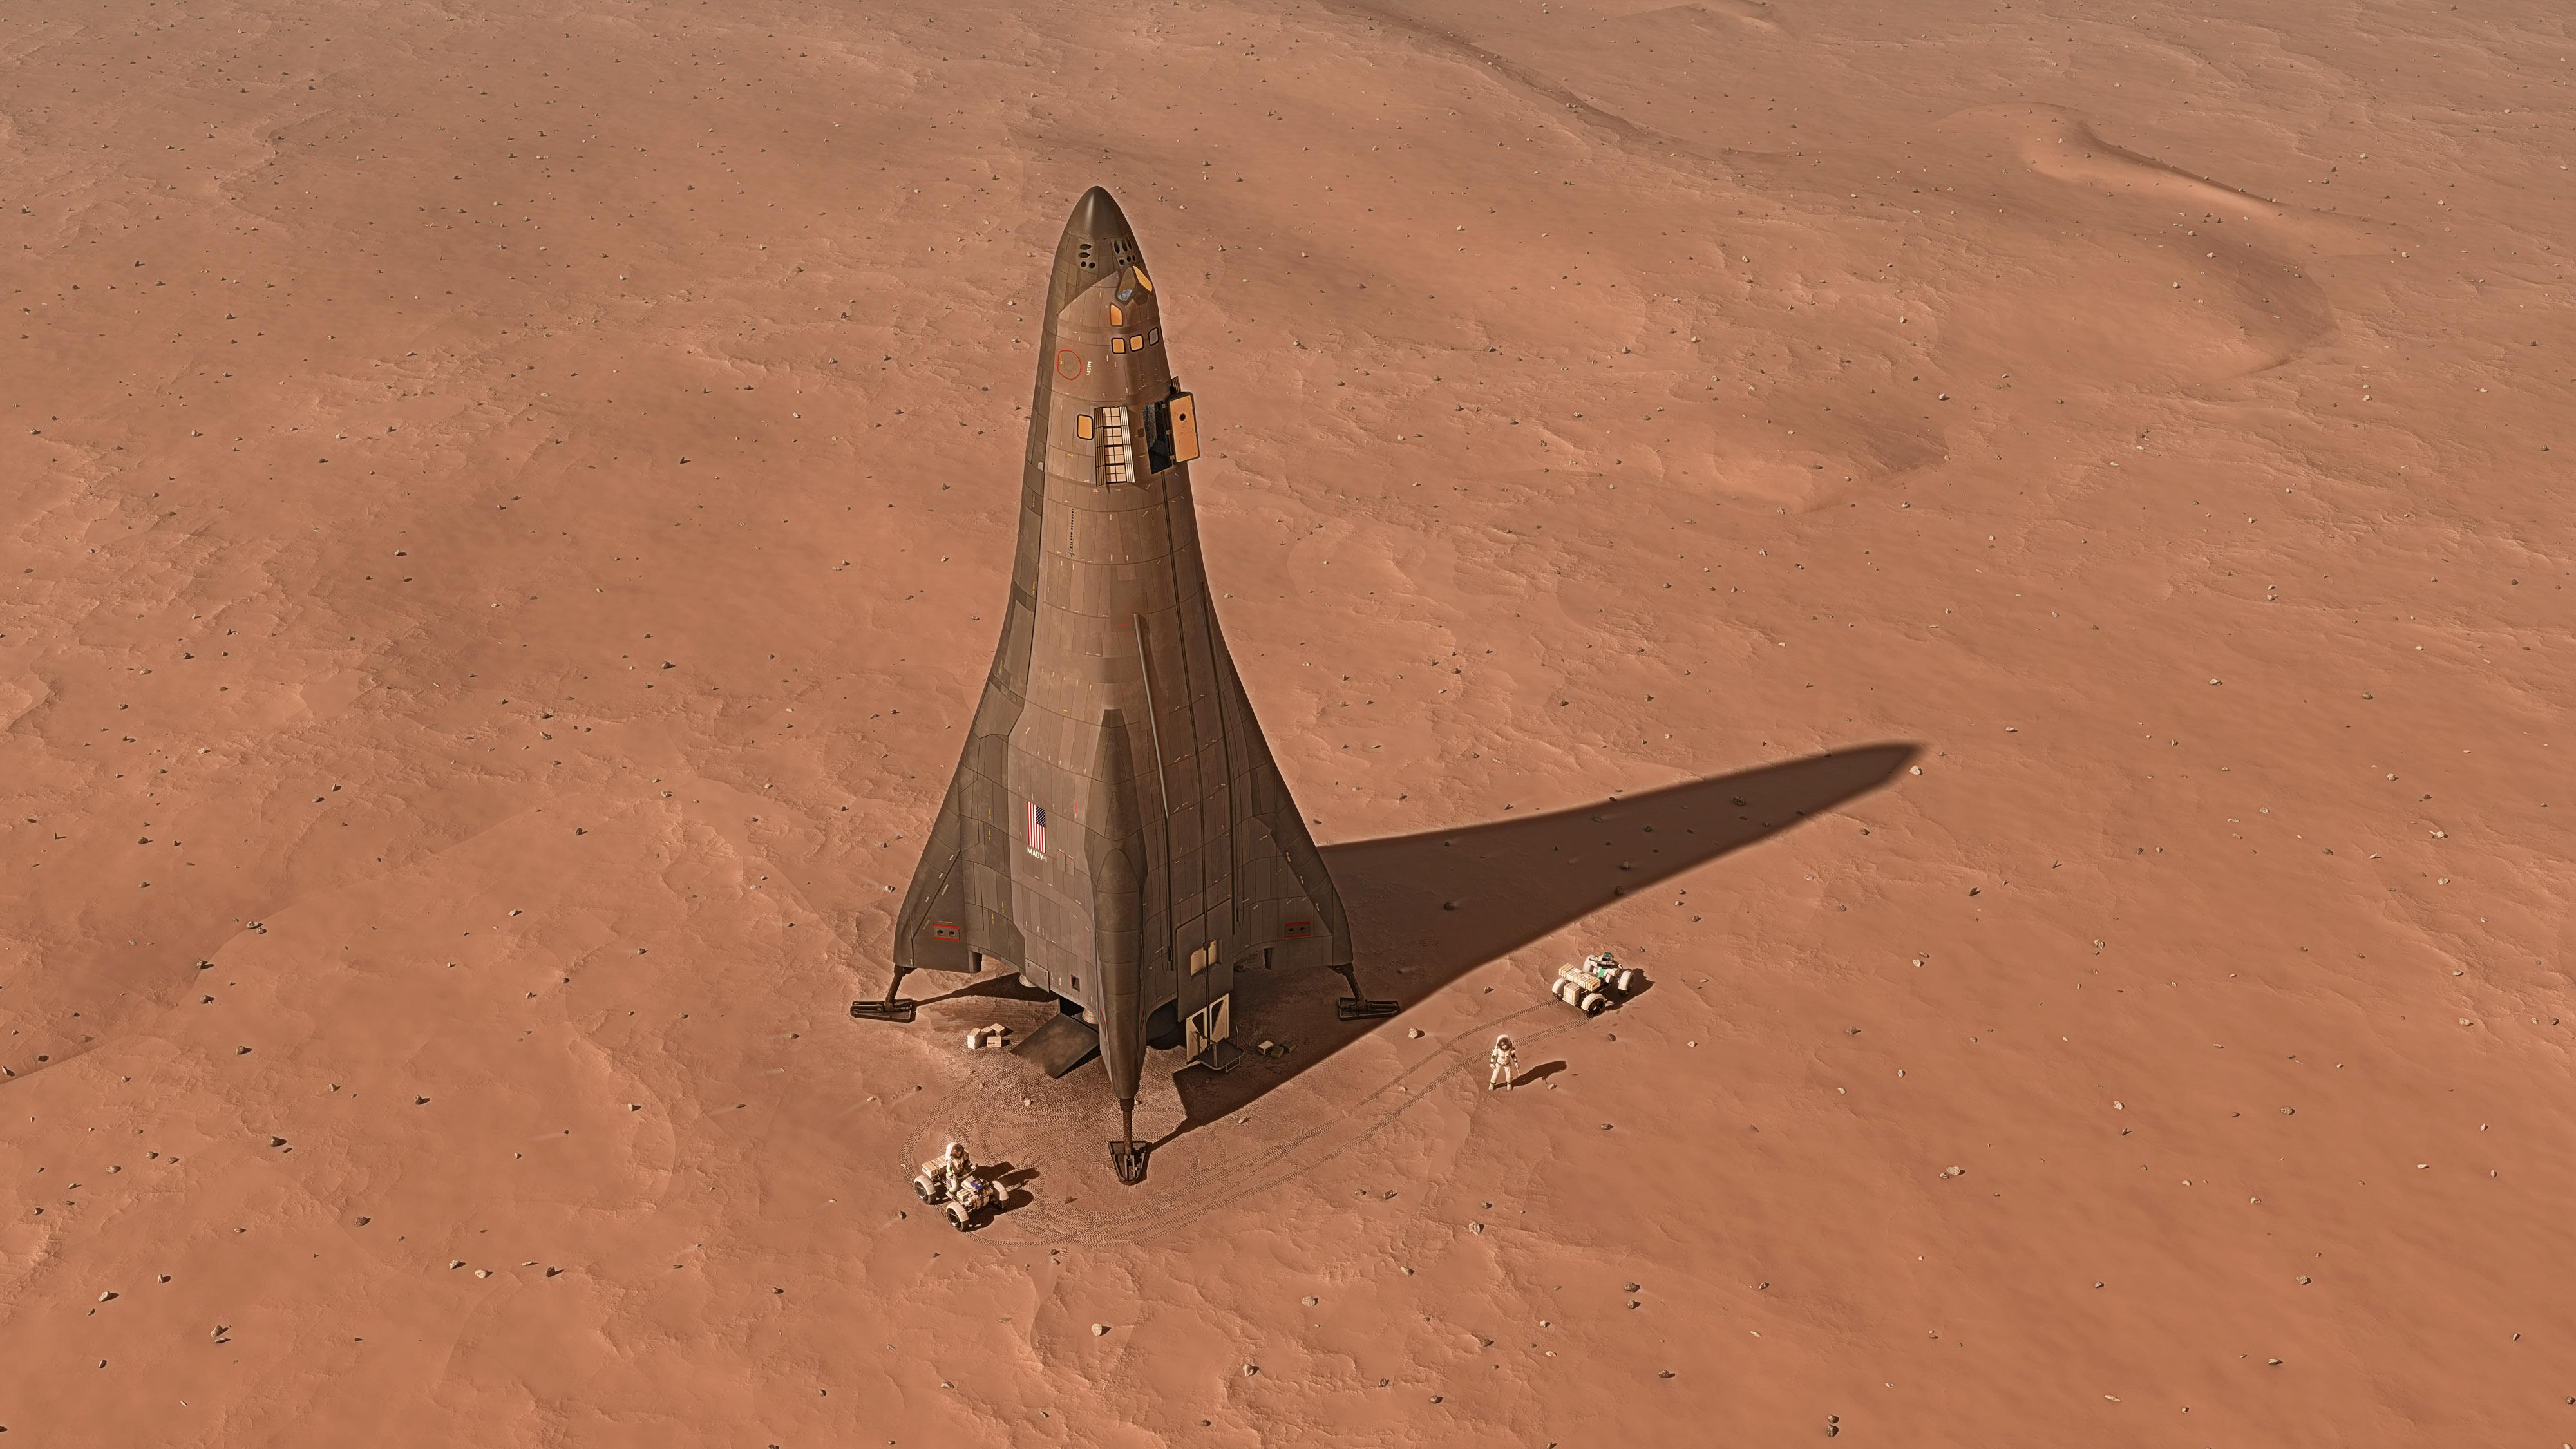 Lockheed Martin презентовала план покорения Марса